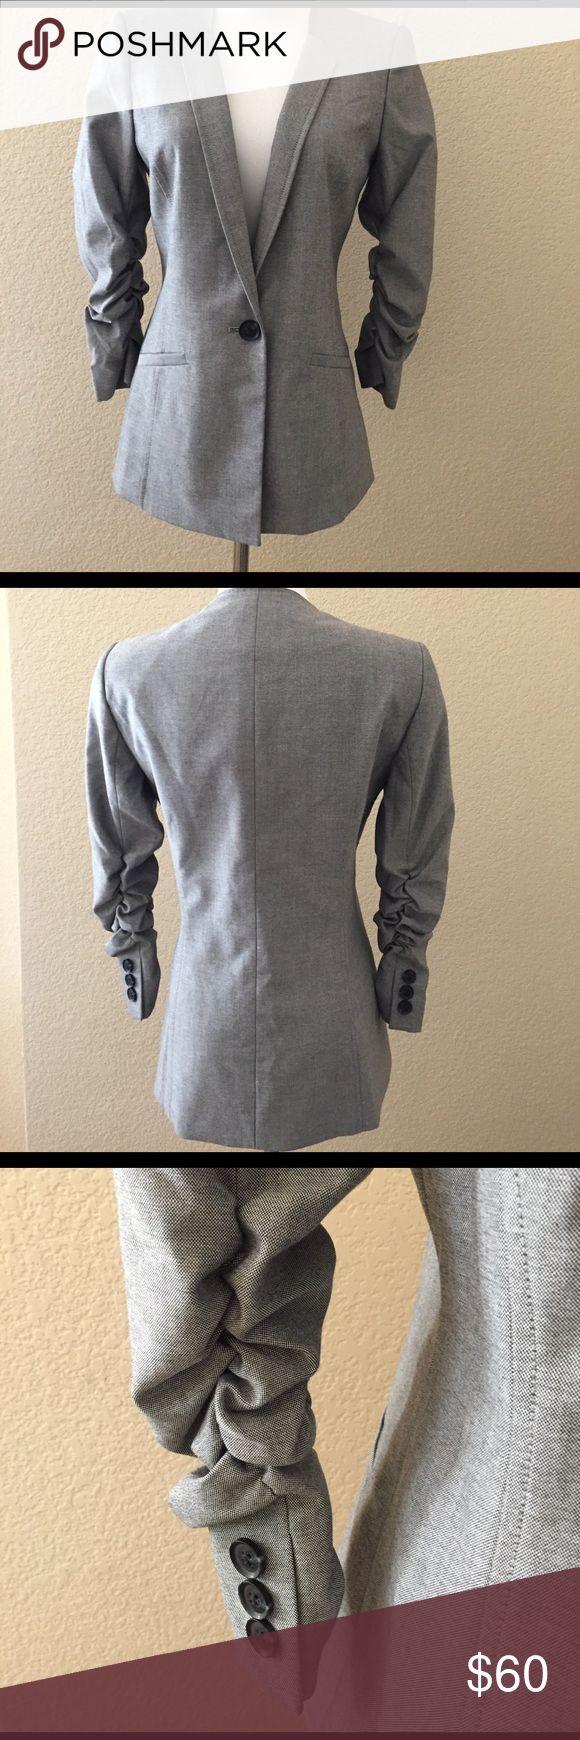 NWT ANTONIO MELANI BLAZER NET Antonio Melani blazer.  Size 2. Scrunched up sleeves.  Button in front. ANTONIO MELANI Jackets & Coats Blazers